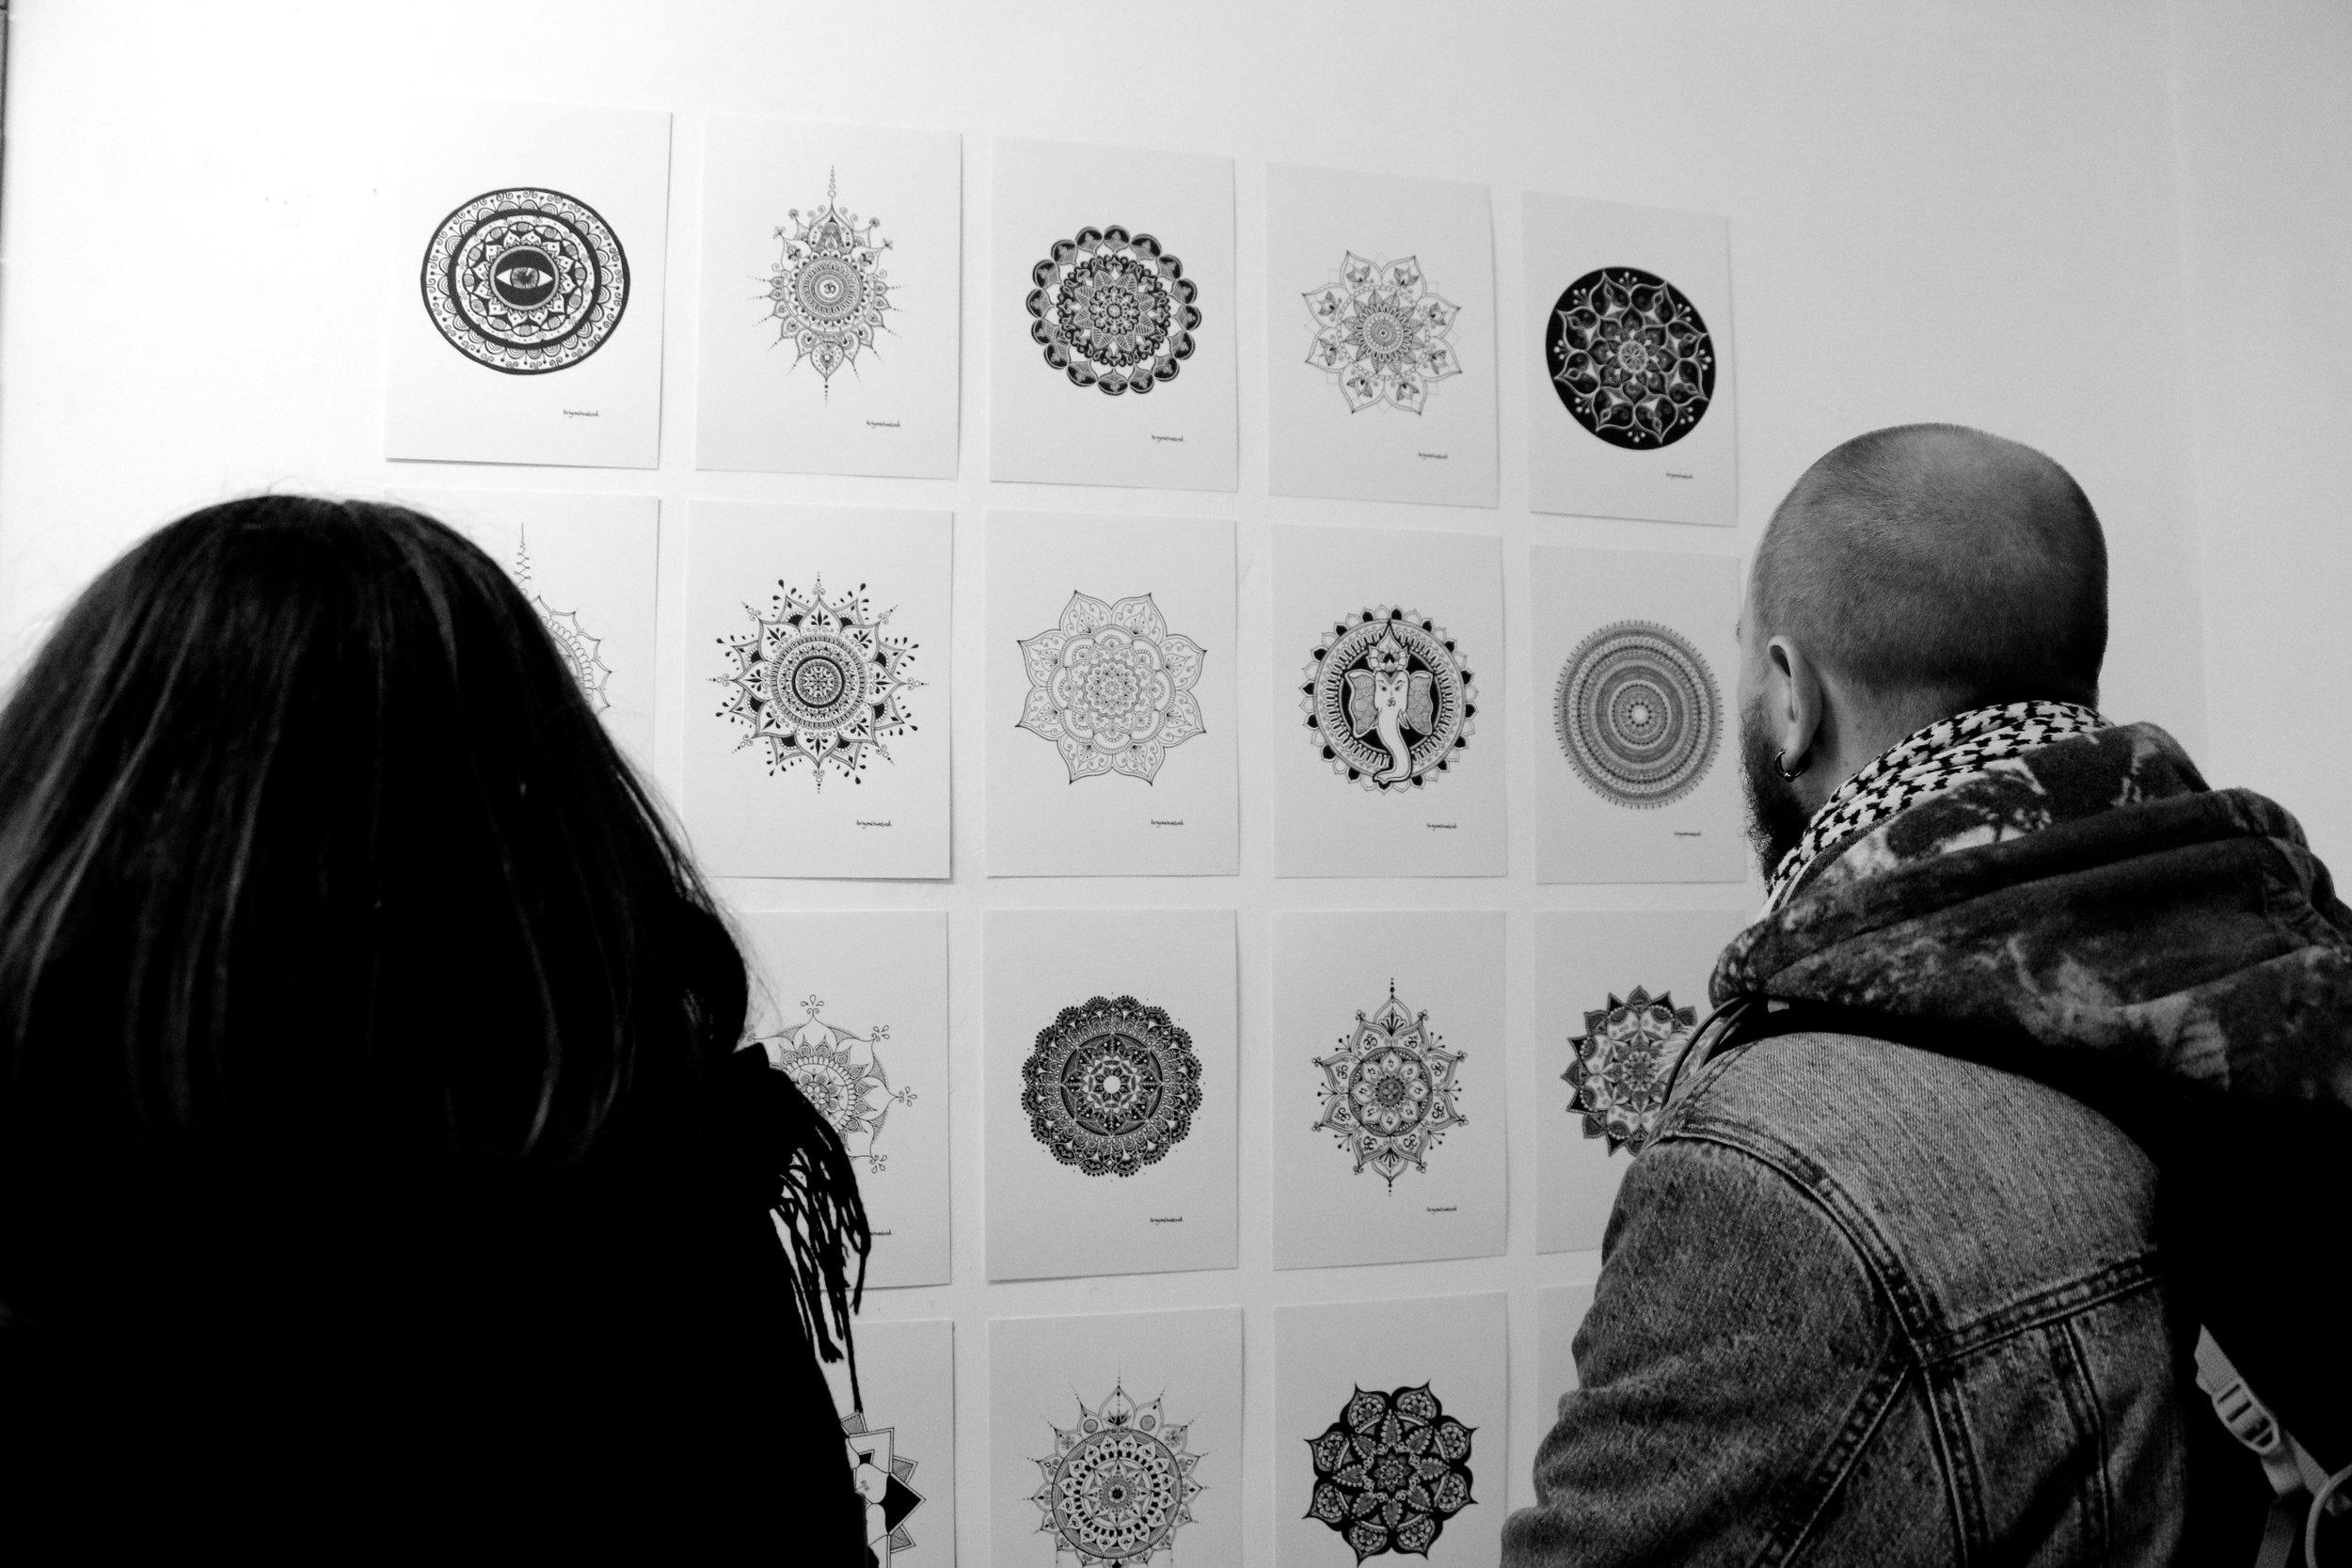 fortyonehundred-1st-generation-mandalas-at-exhibition